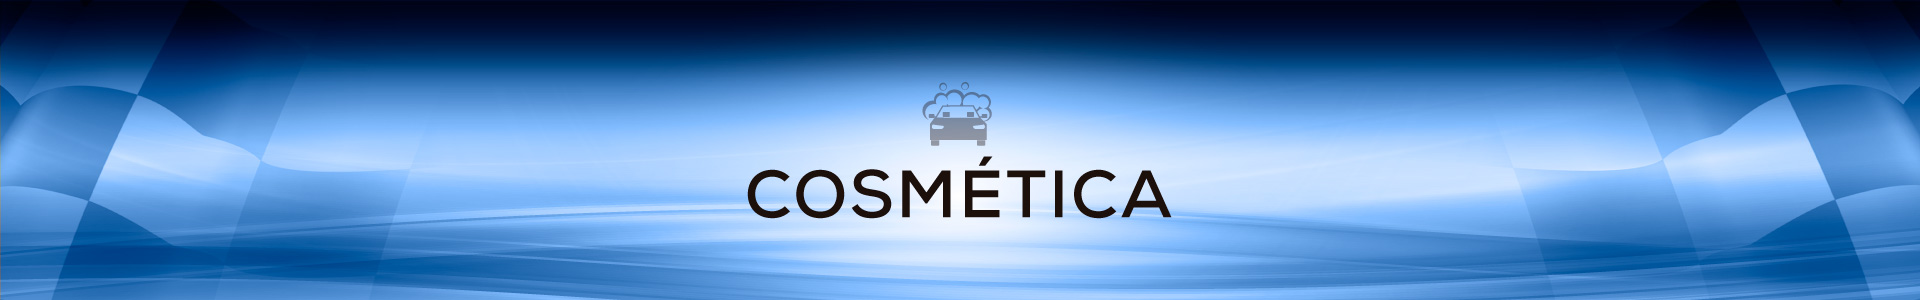 cosmetica-1920x300